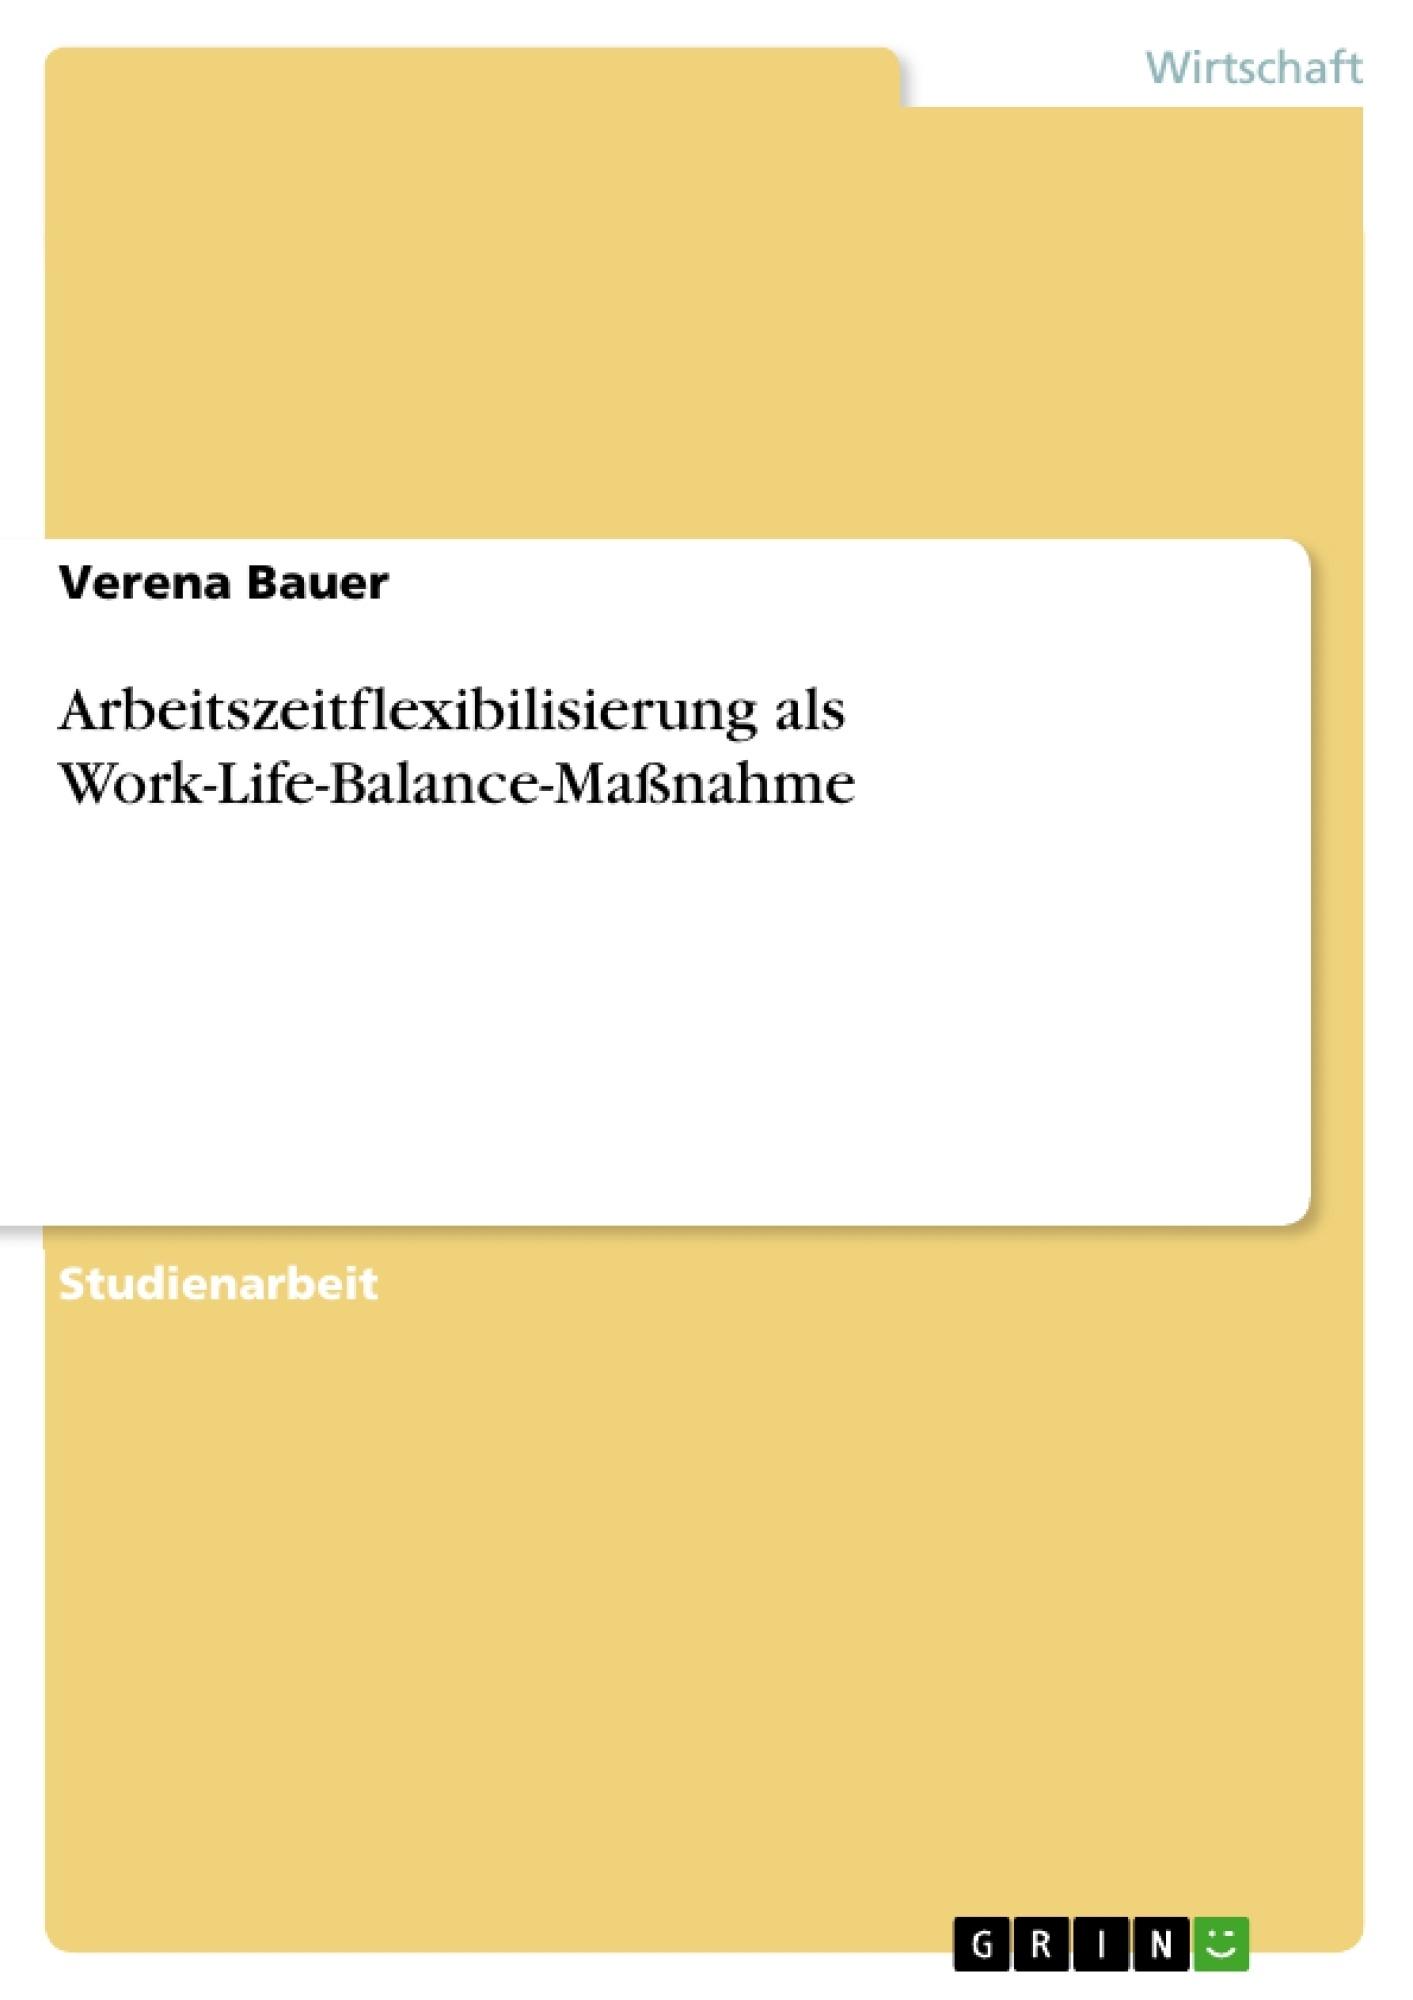 Titel: Arbeitszeitflexibilisierung als Work-Life-Balance-Maßnahme